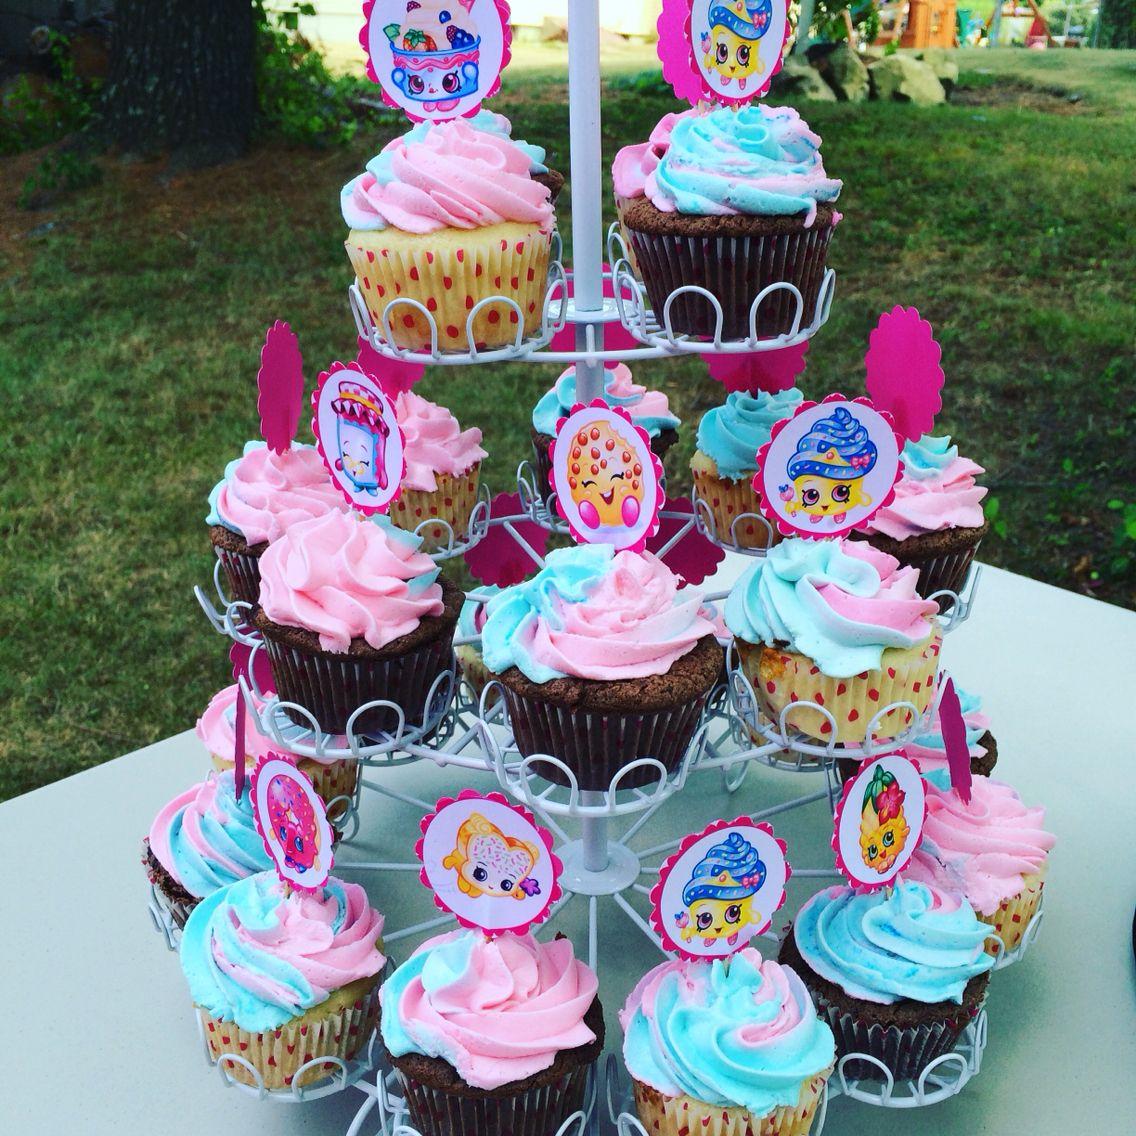 Shopkin Cupcakes Sugarloveevents Shopkins Birthday Party Cake Shopkins Birthday Shopkins Birthday Party